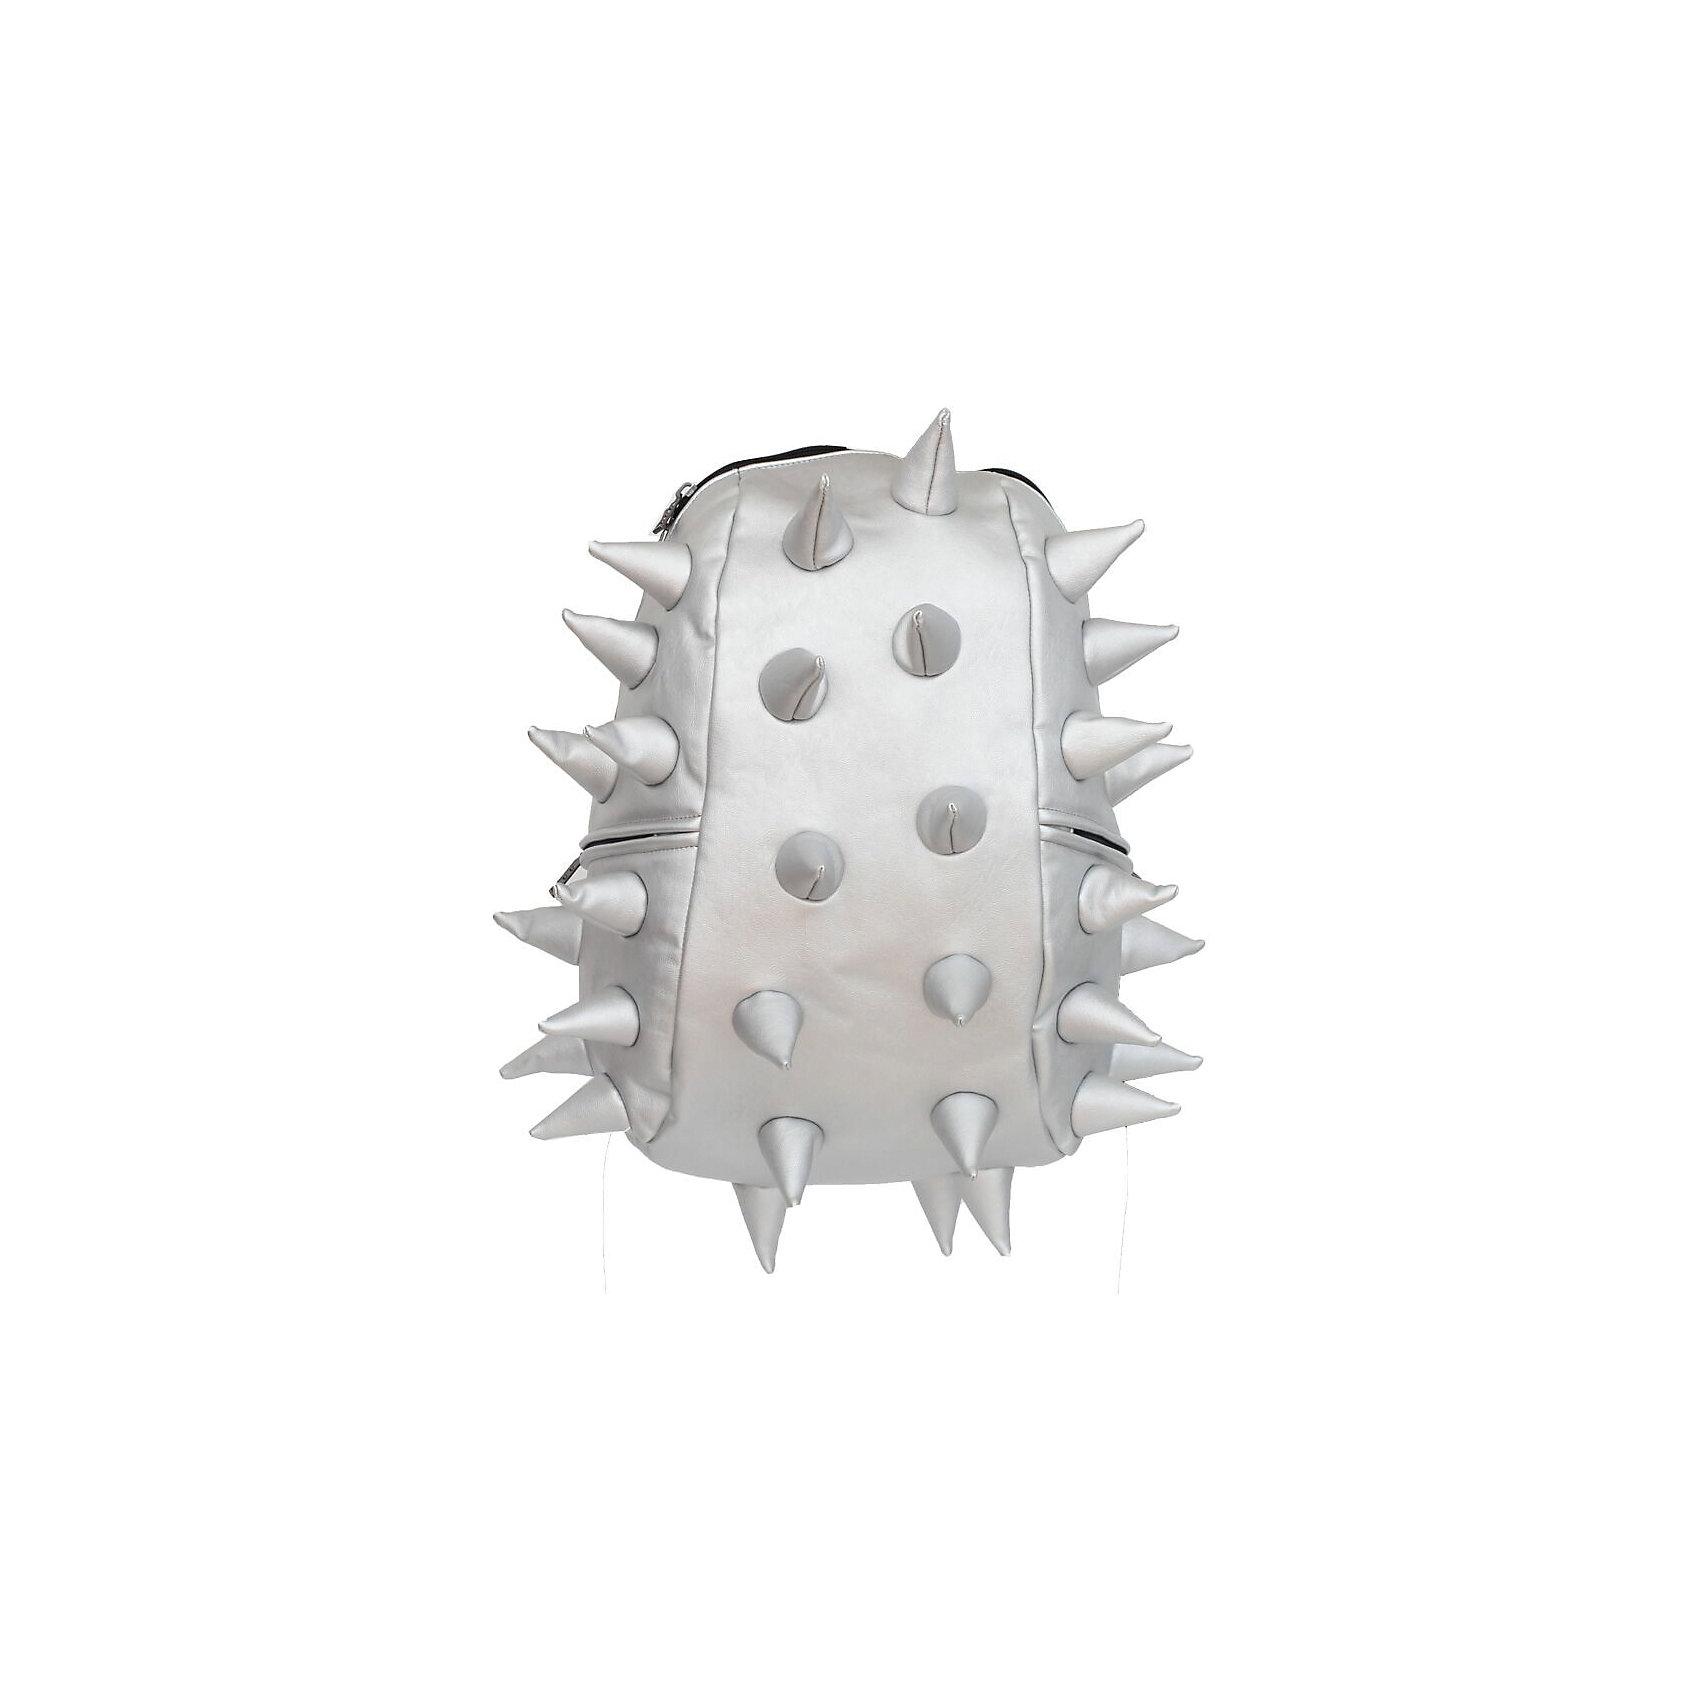 Рюкзак Rex Full Heavy Metal Spike Silver, цвет сереброРюкзаки<br>Вес: 0,8 кг<br>Размер: 46х35х20 см<br>Состав: рюкзак<br>Наличие светоотражающих элементов: нет<br>Материал: полиуретан<br><br>Ширина мм: 460<br>Глубина мм: 350<br>Высота мм: 200<br>Вес г: 800<br>Возраст от месяцев: 60<br>Возраст до месяцев: 720<br>Пол: Унисекс<br>Возраст: Детский<br>SKU: 7054101